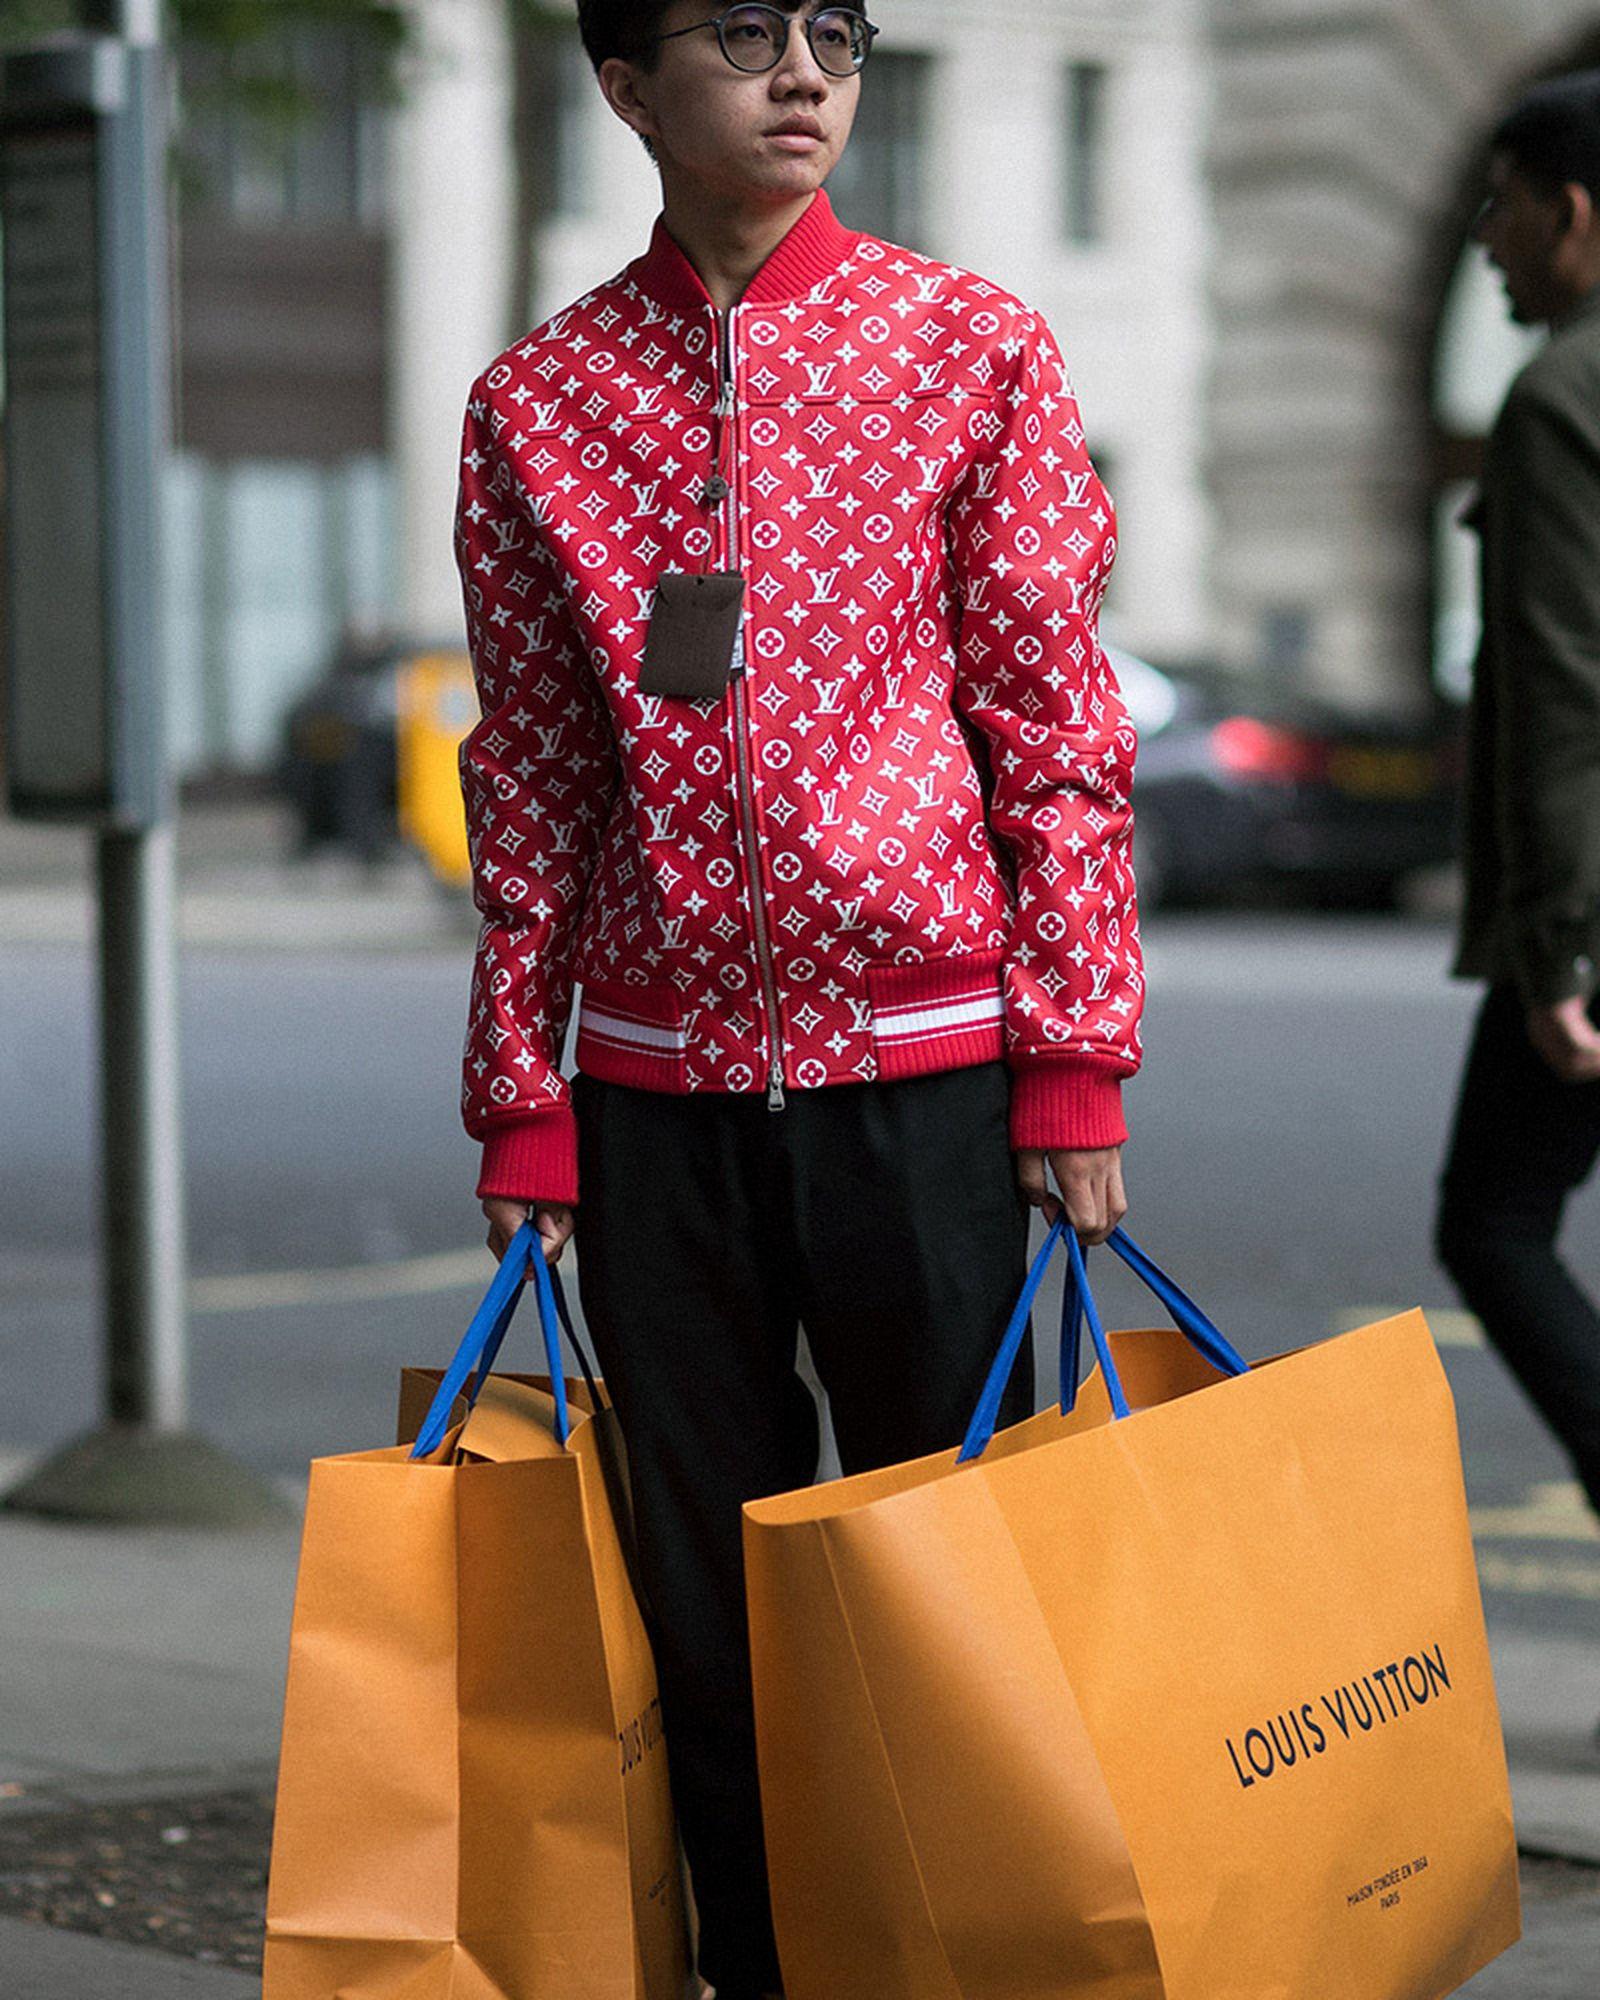 fashion-world-post-corona-industry-03